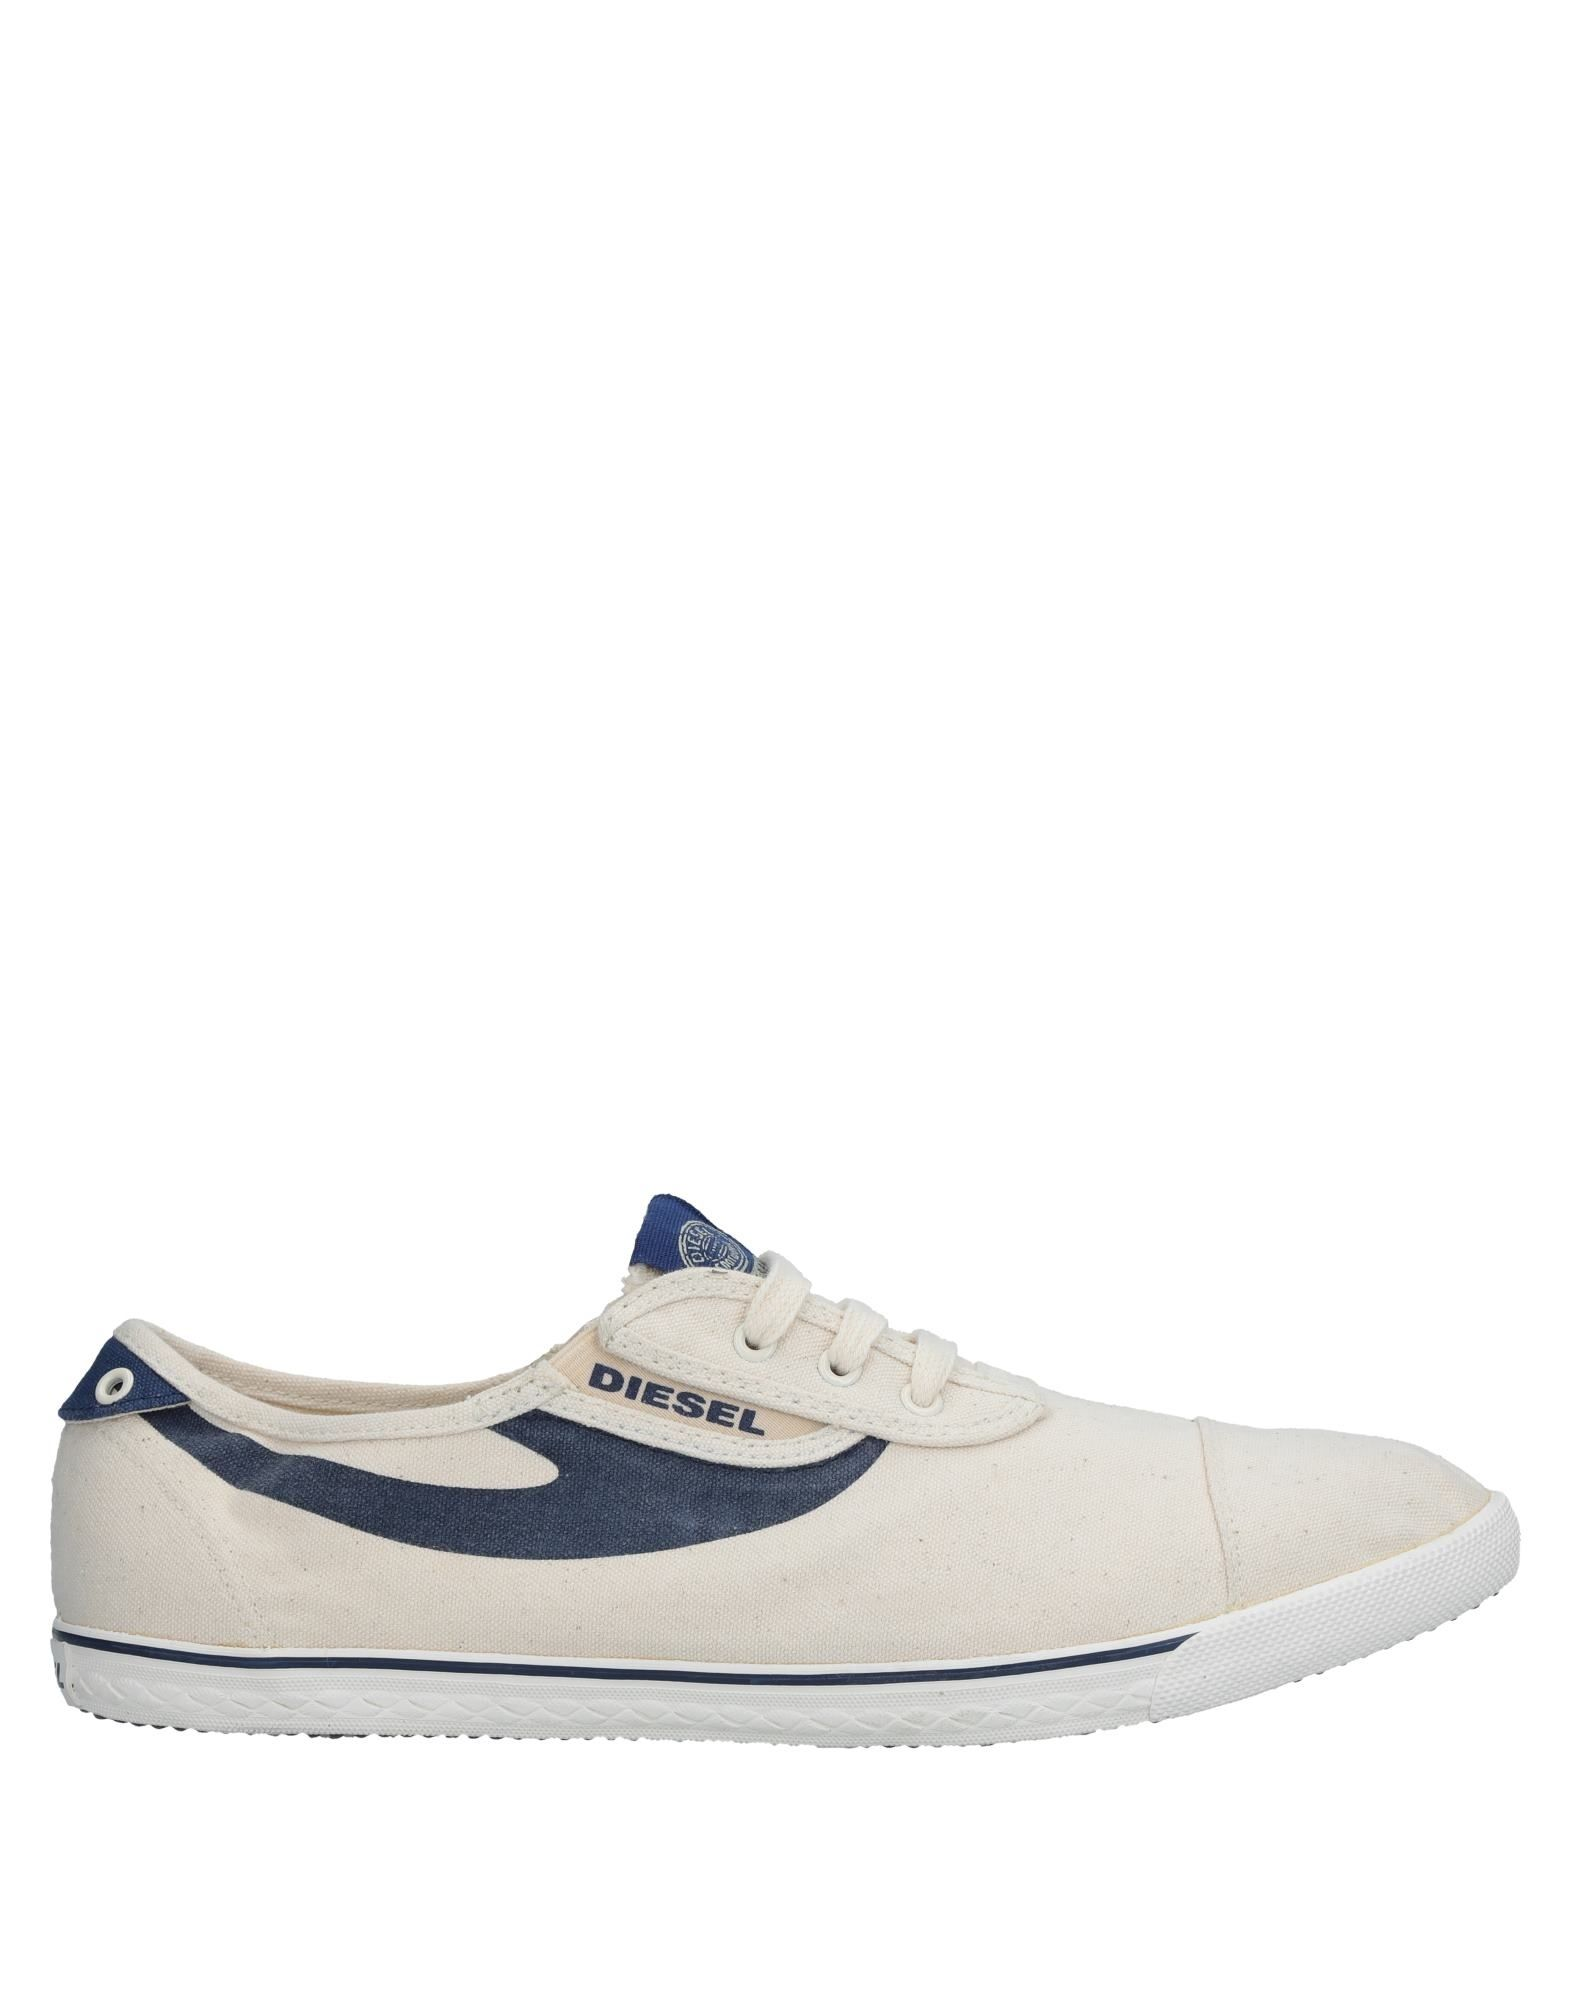 Moda Sneakers Sneakers Moda Diesel Uomo - 11523805UX 826298